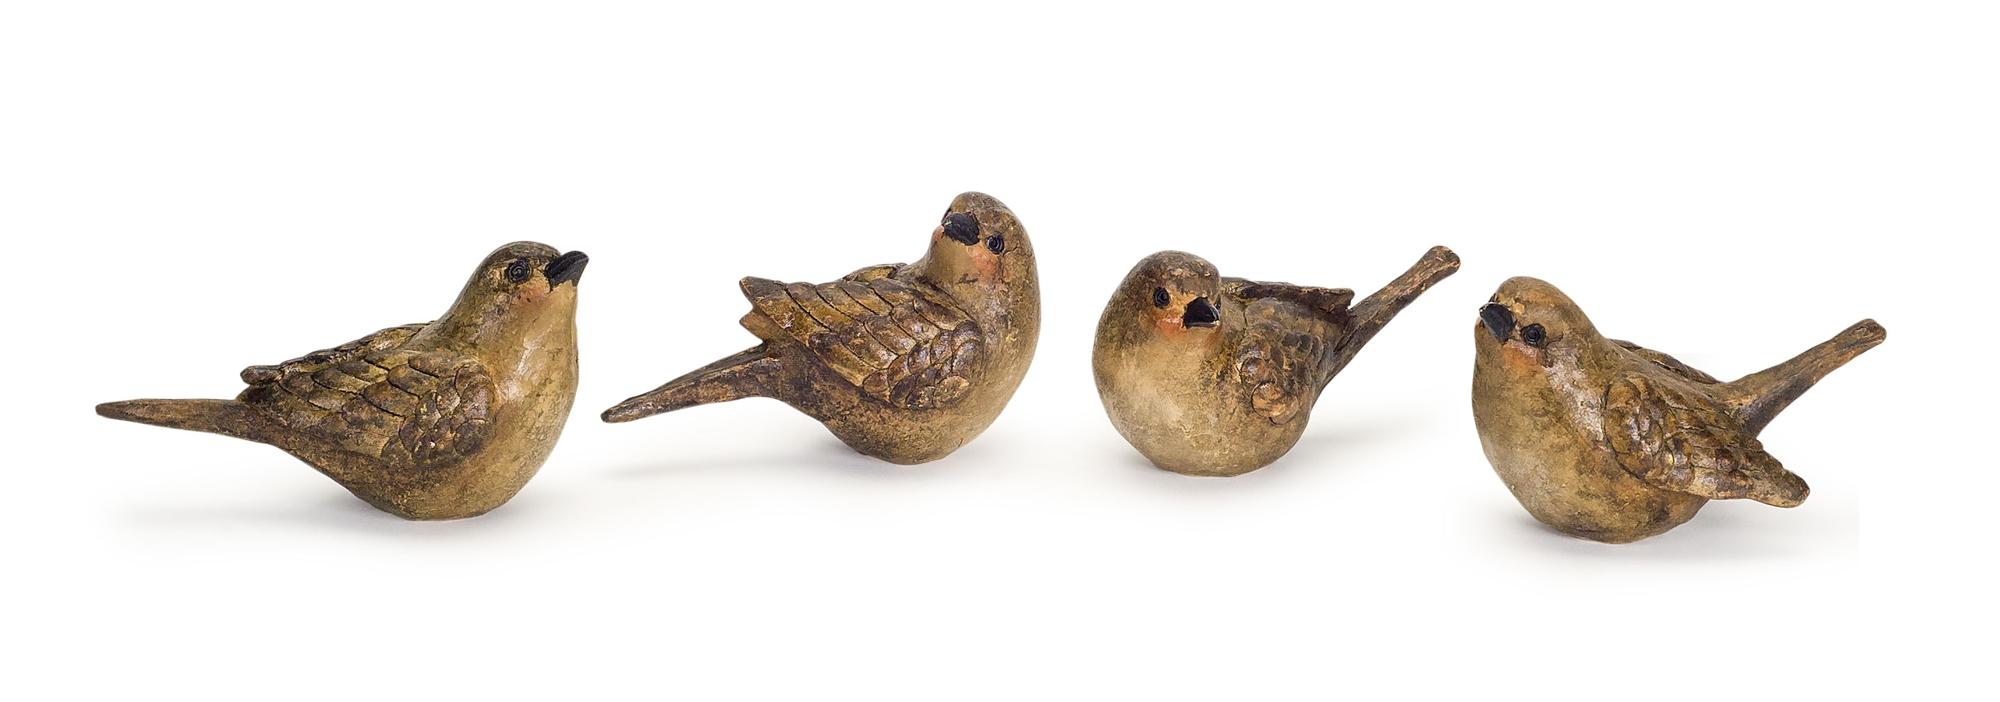 "Birds (Set of 8) 3.5"" x 3"" Resin"